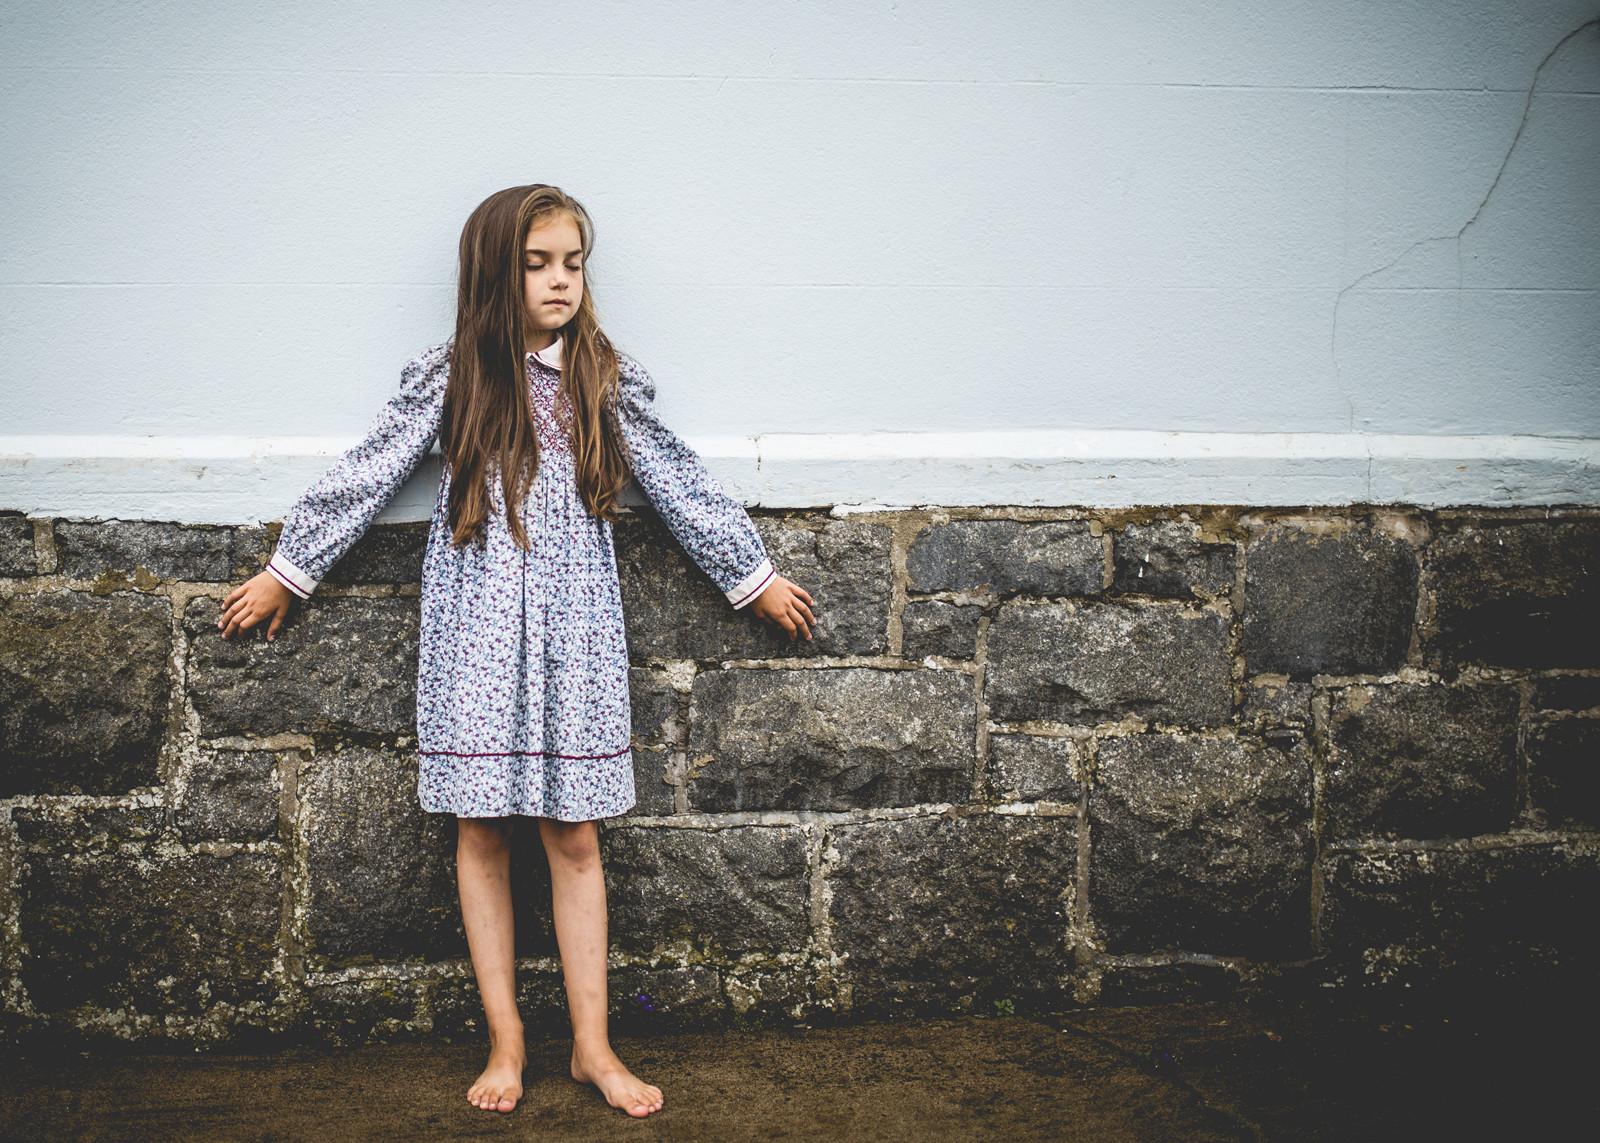 COLOUR - Past,Present,Future by Evita Browne (12 marks)